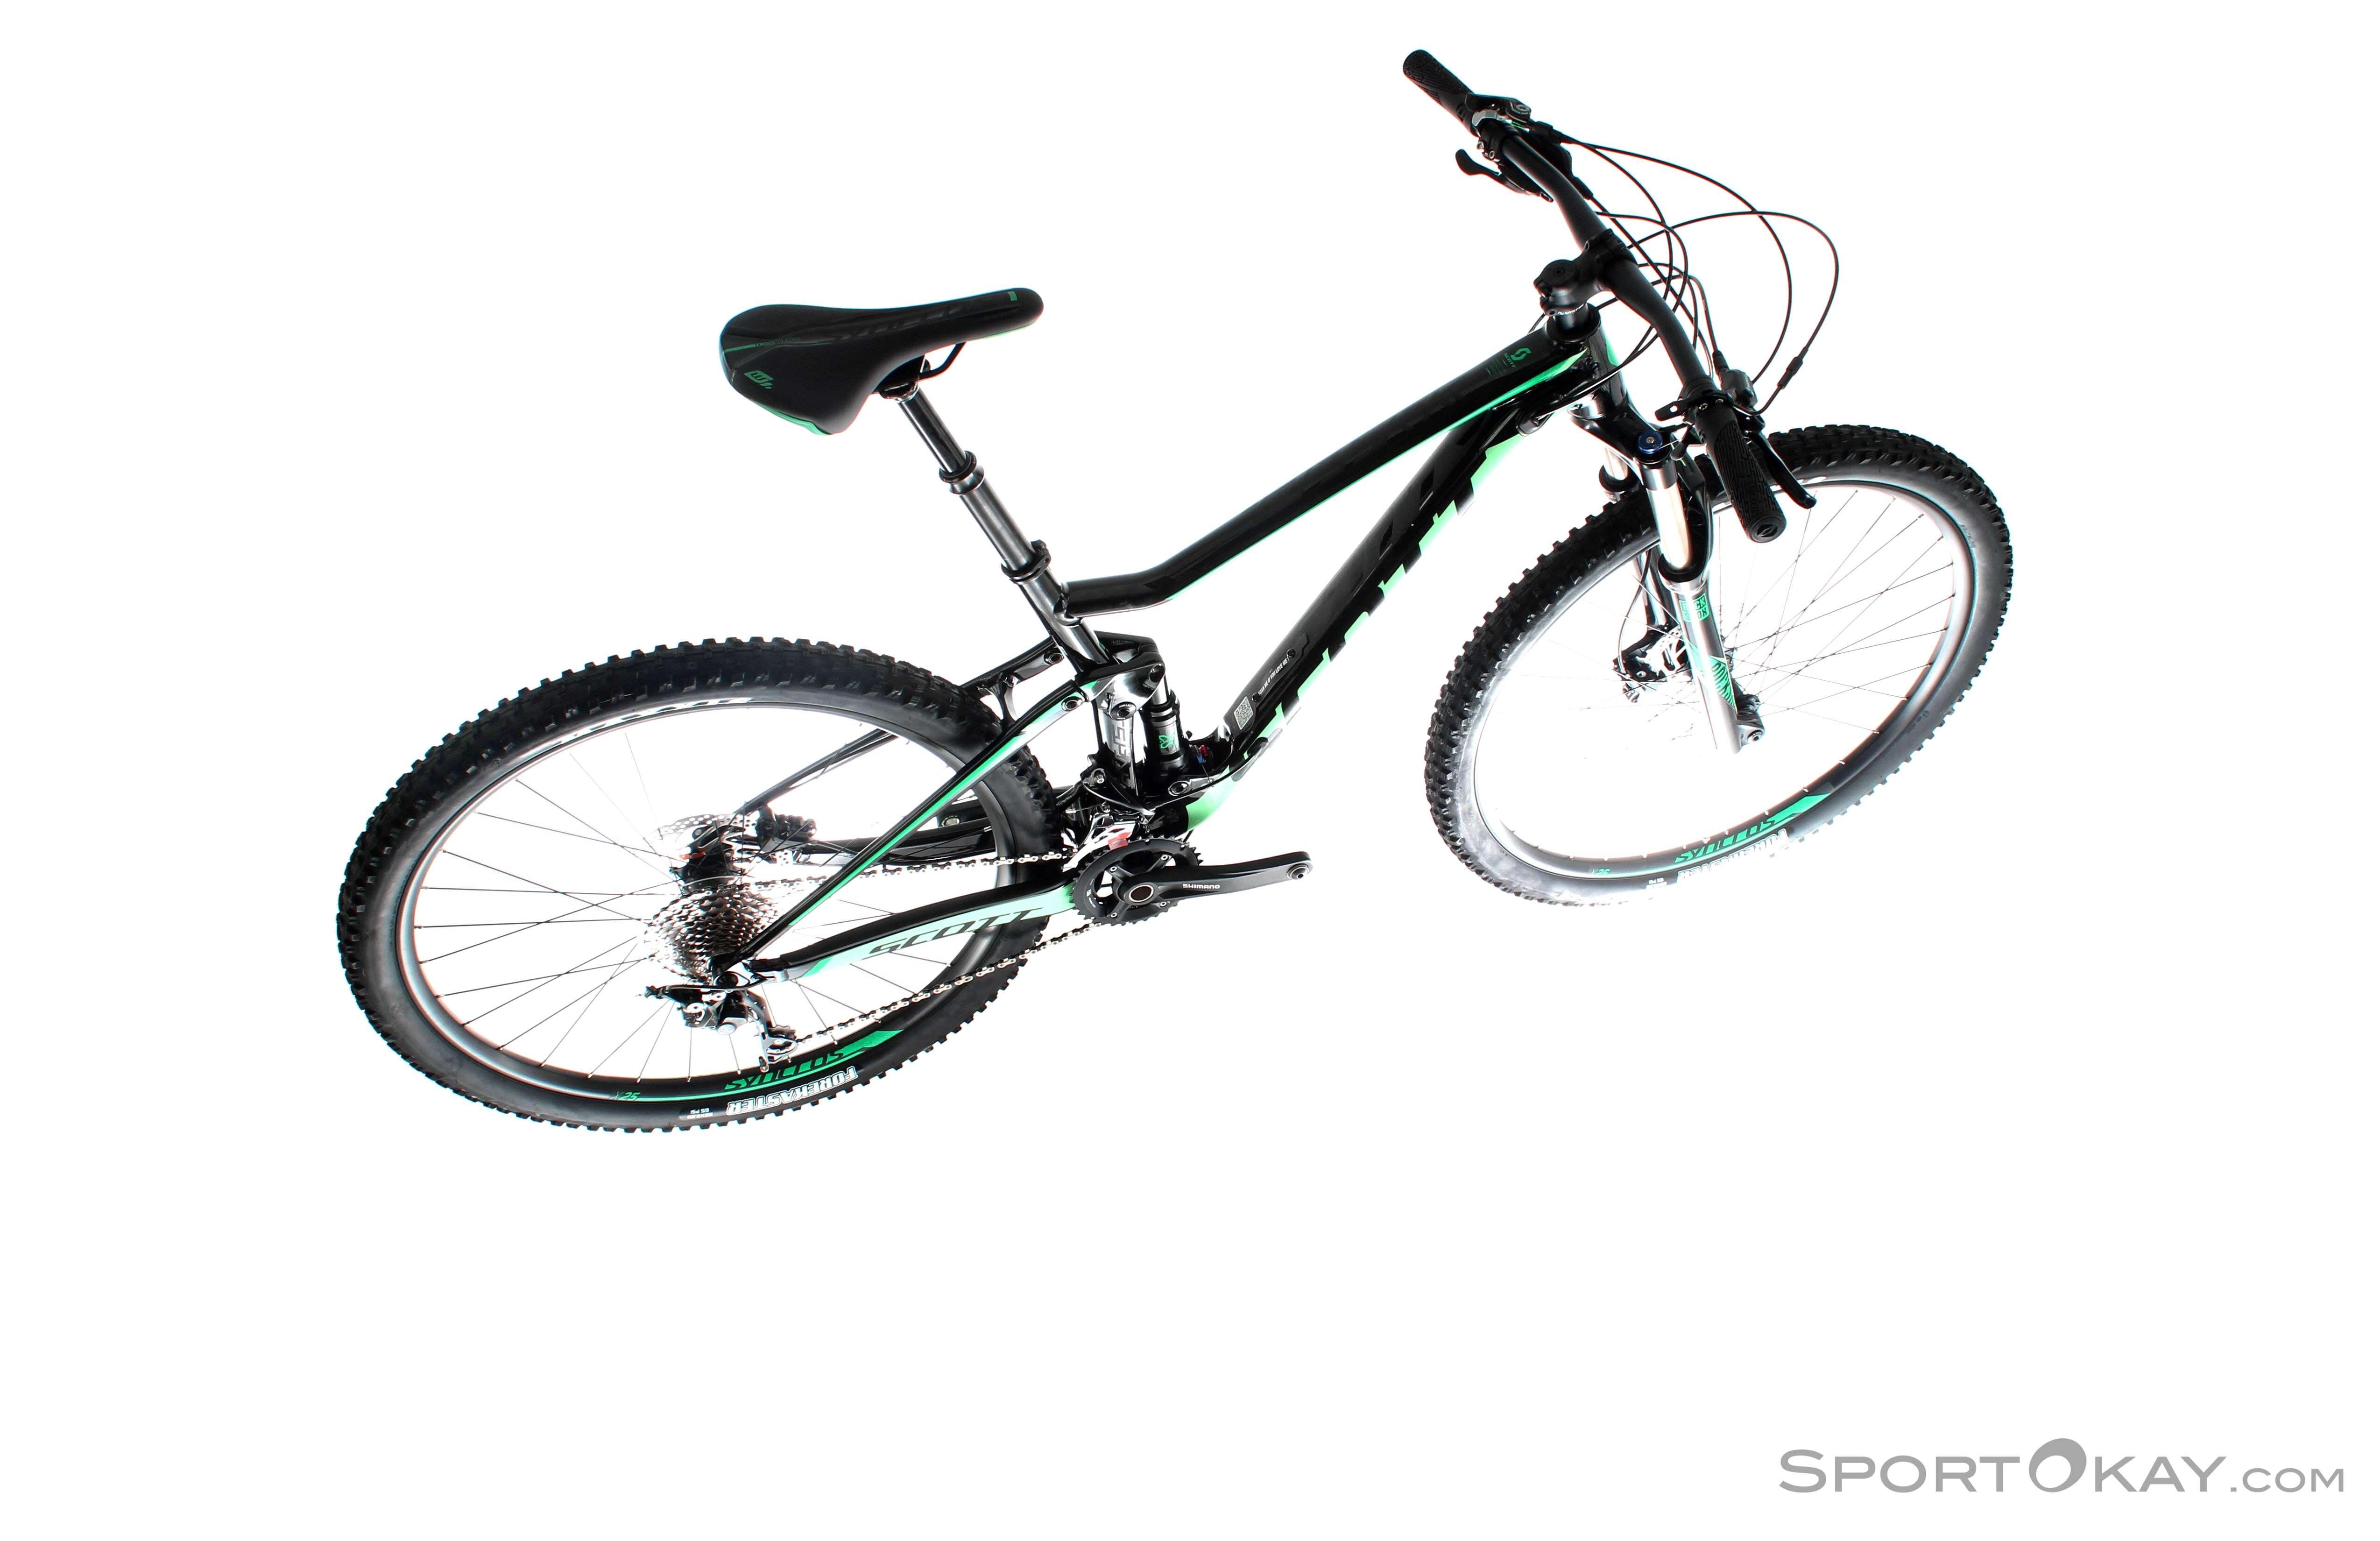 5ee823335f Scott Contessa Spark 930 2018 Womens Trail Bike - Cross Country ...